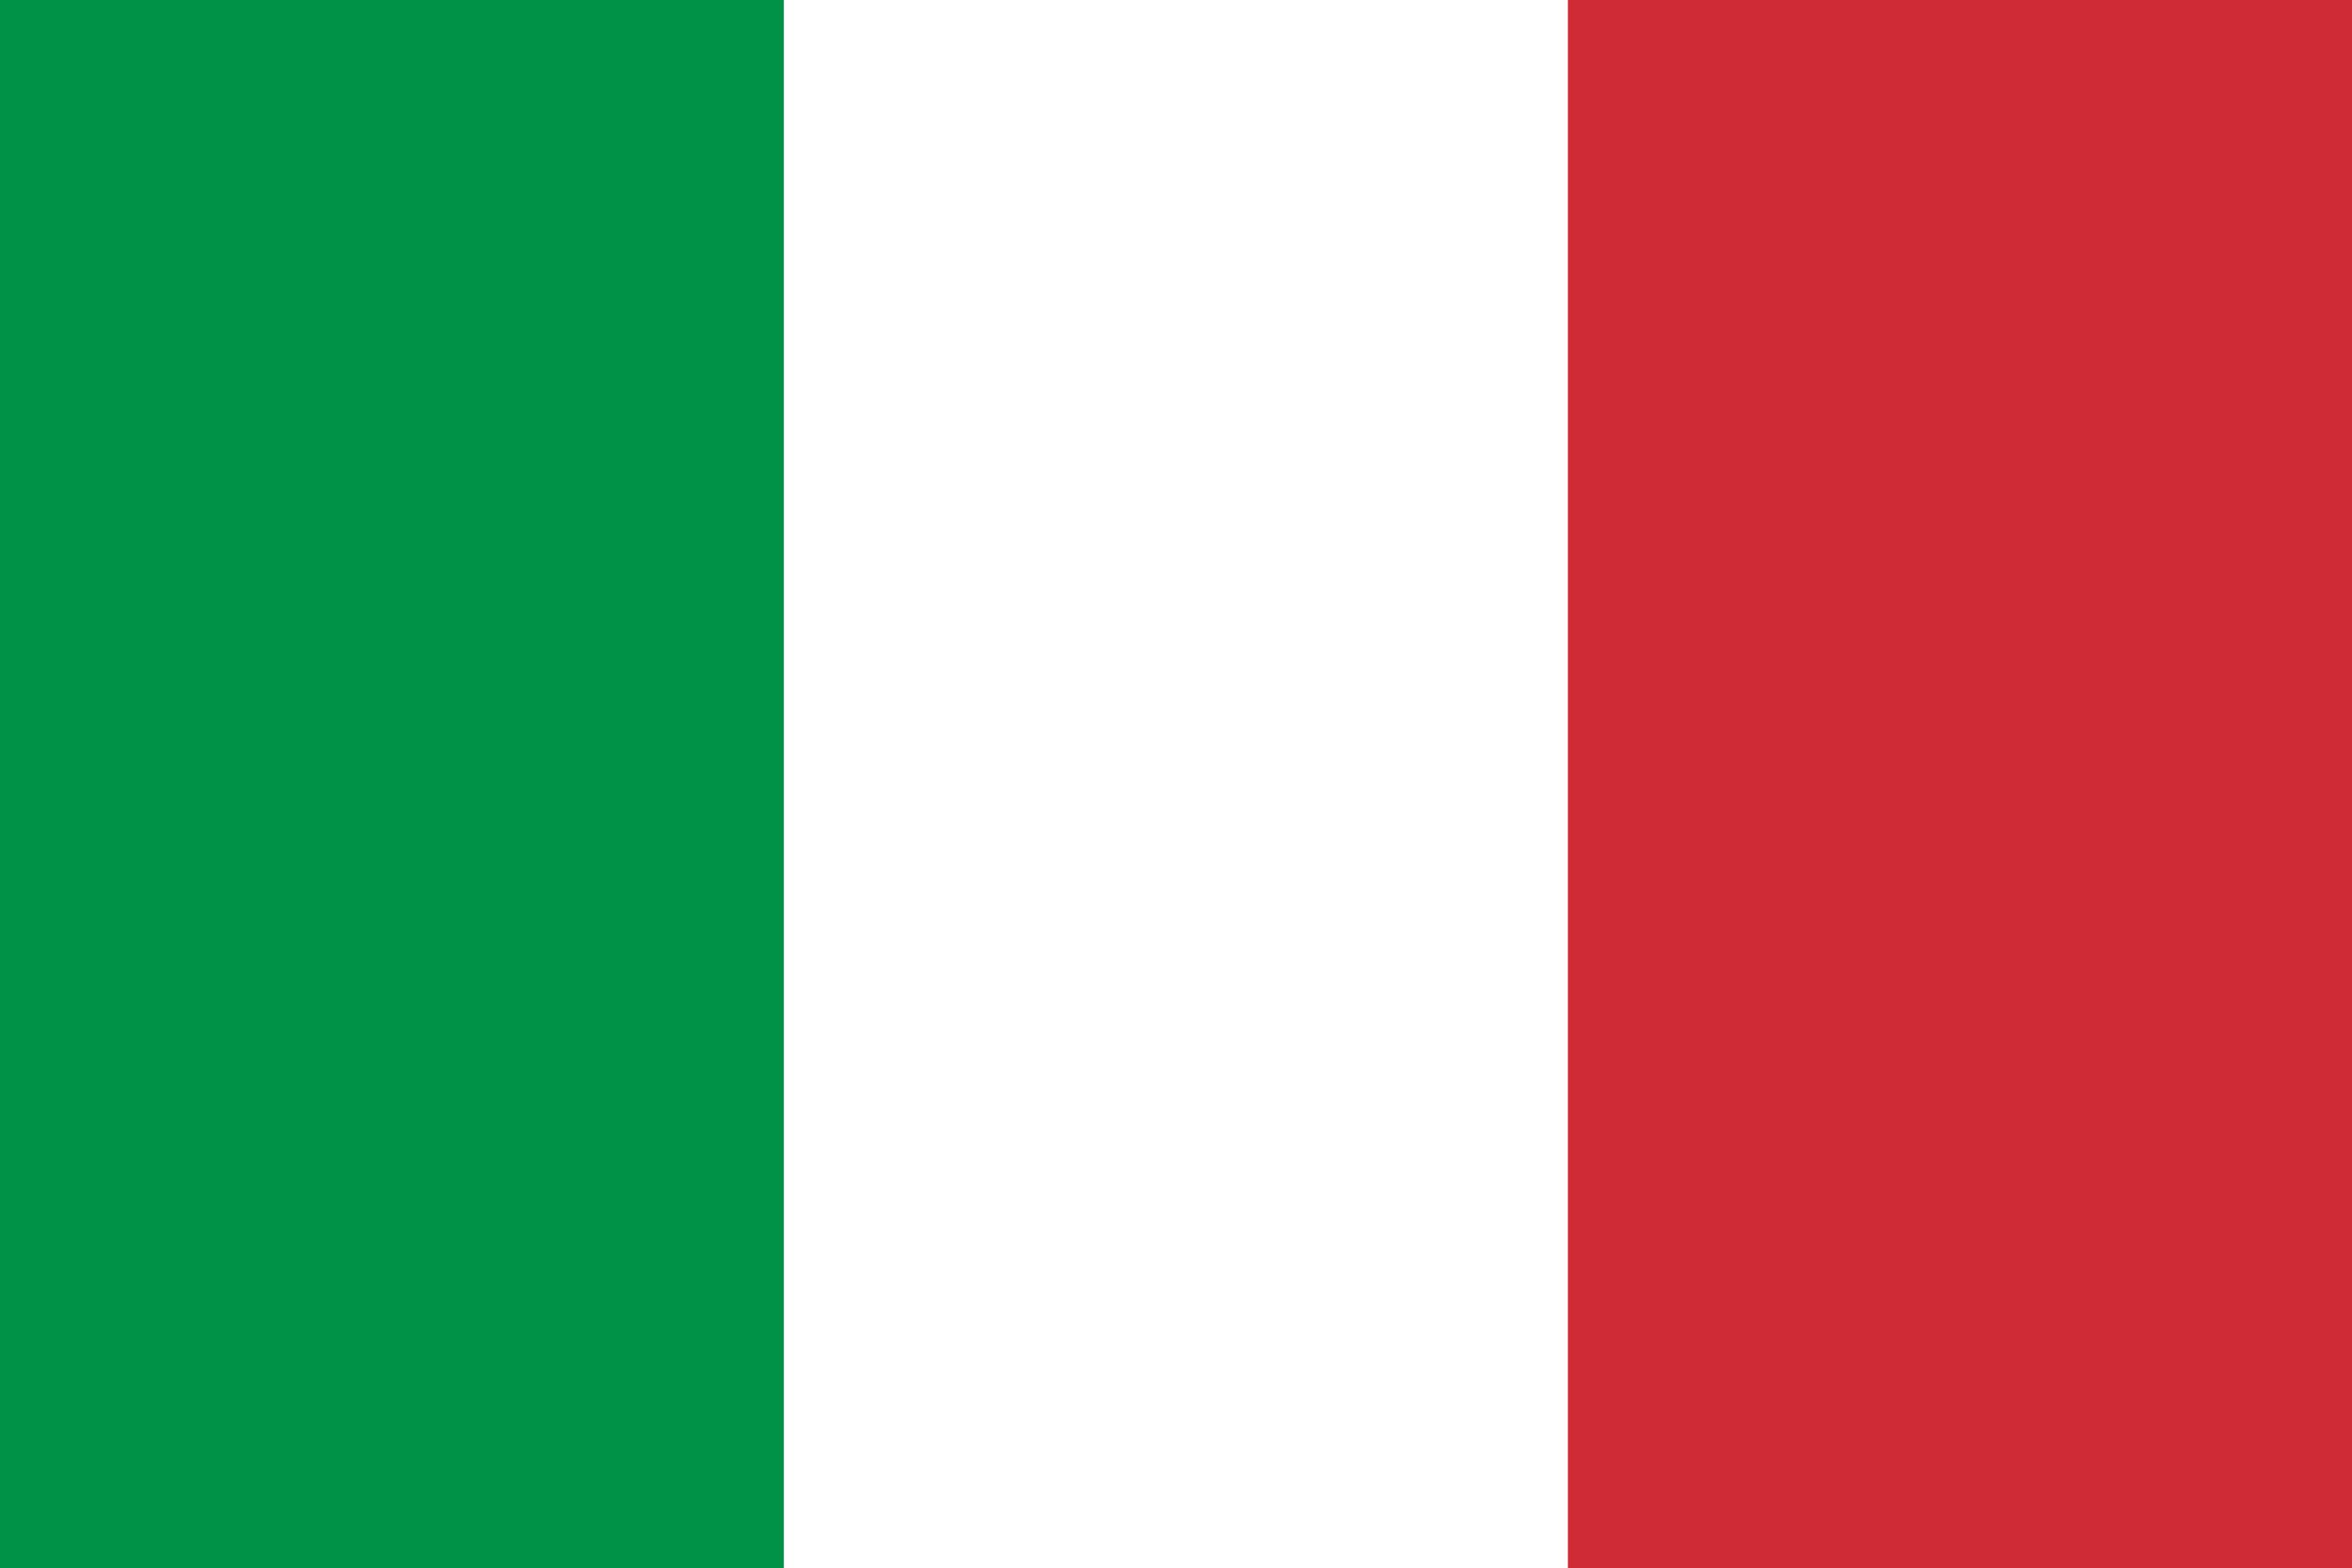 Bandera_Italia.png